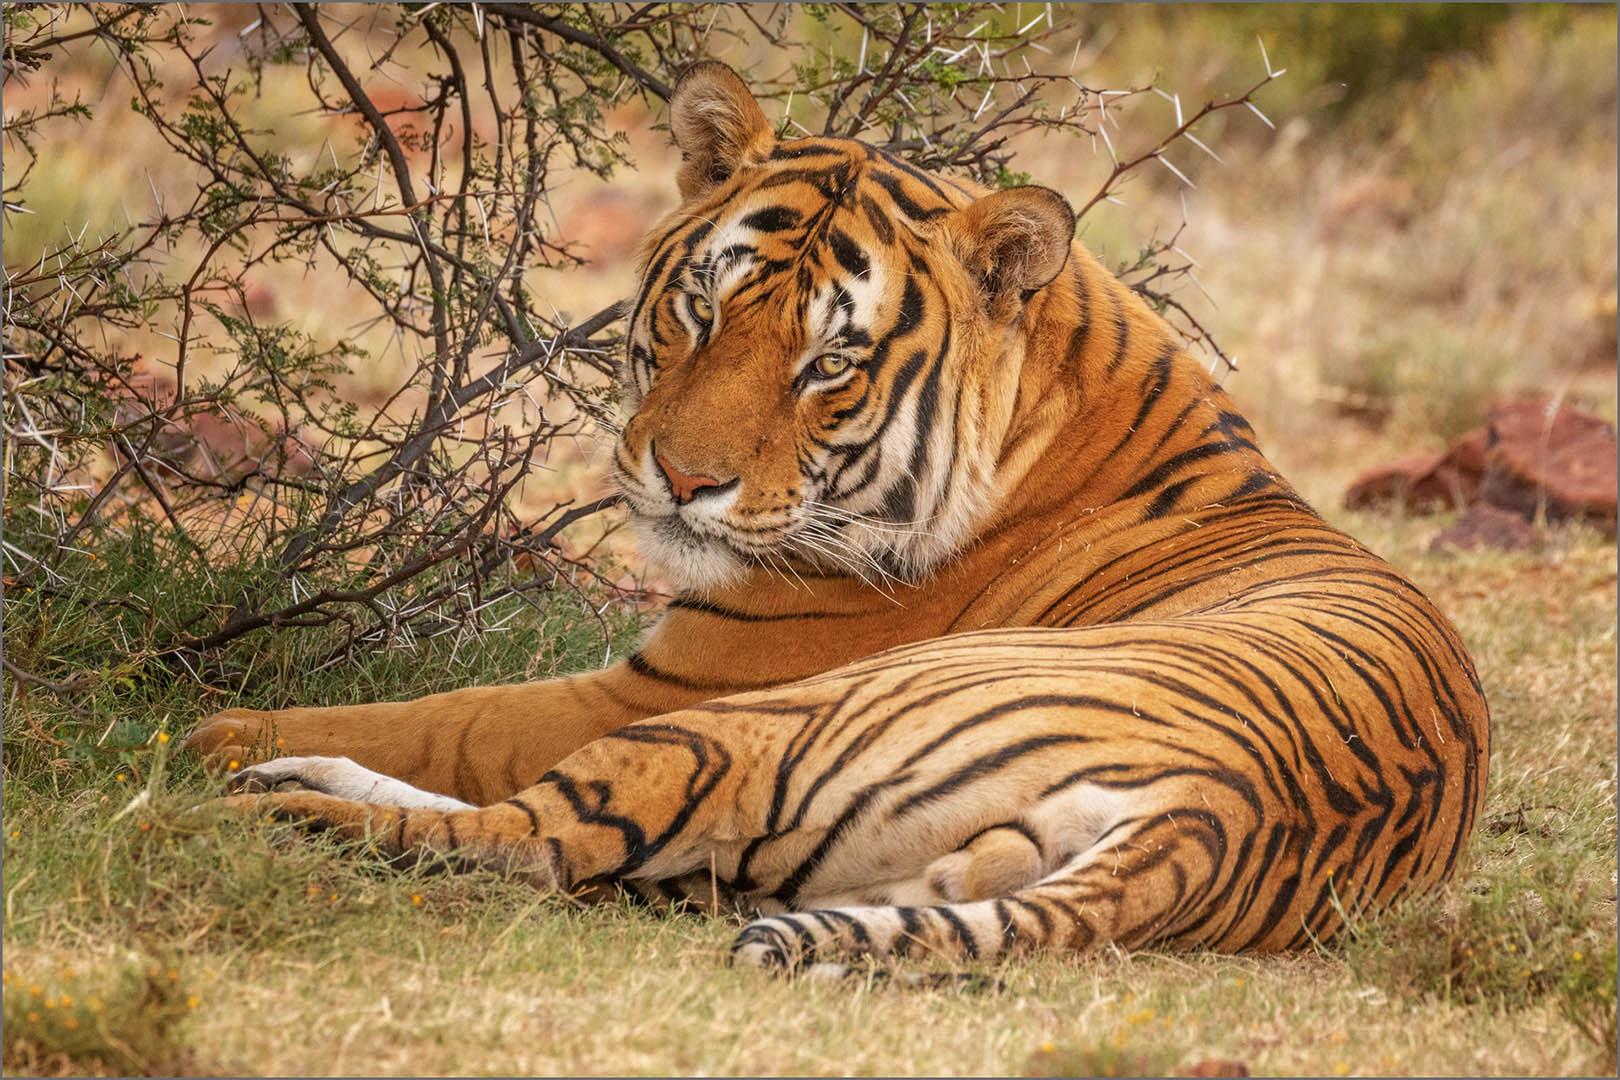 4_NA_Eye of the Tiger _Stephen Kangisser